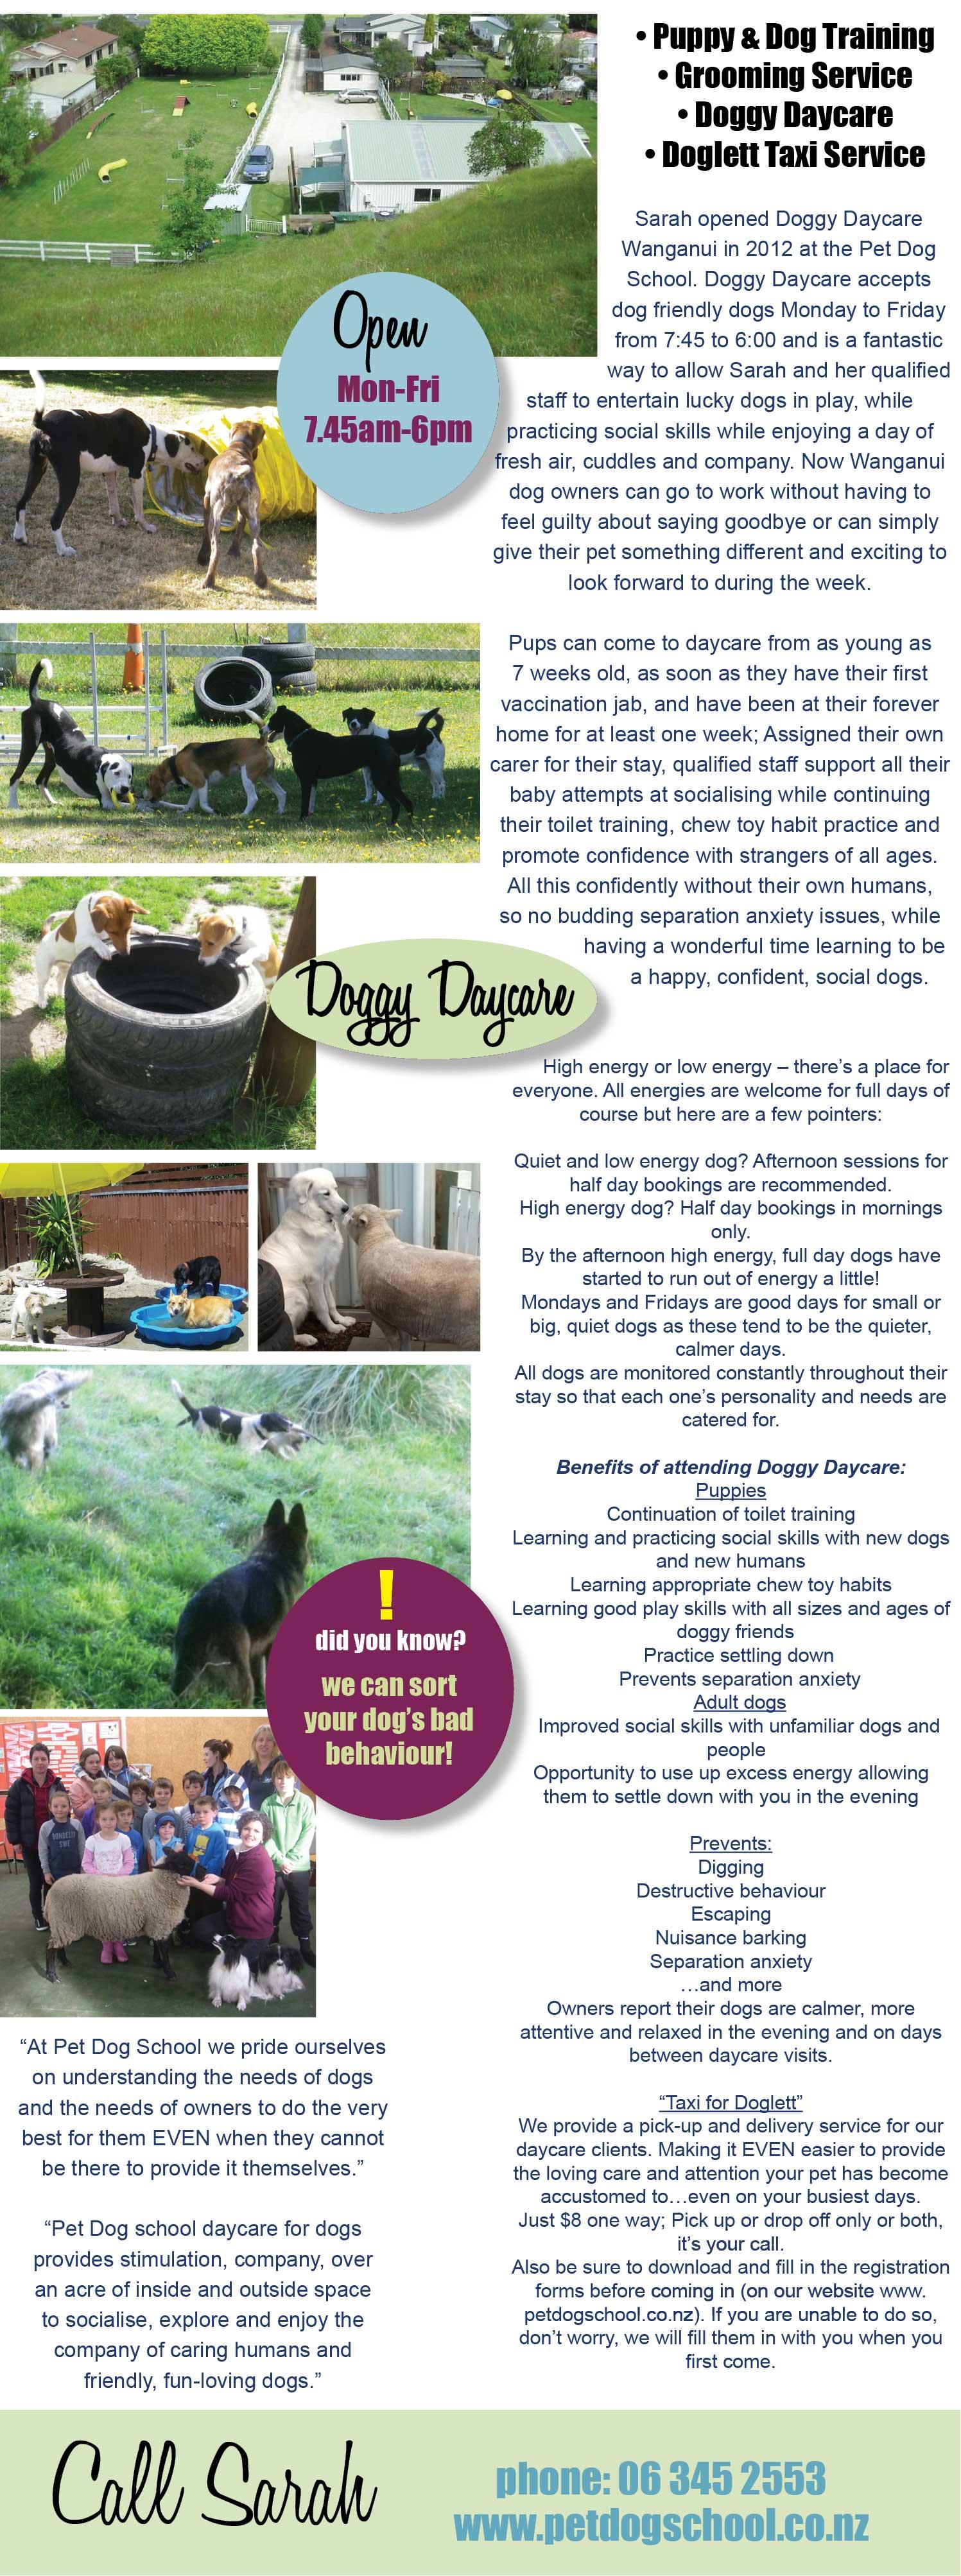 Pet Dog School, Wanganui. Dog Training, Puppy Training, Grooming, dog groomer, dog daycare • Puppy & Dog Training • Grooming Service • Doggy Daycare • Doglett Taxi Service